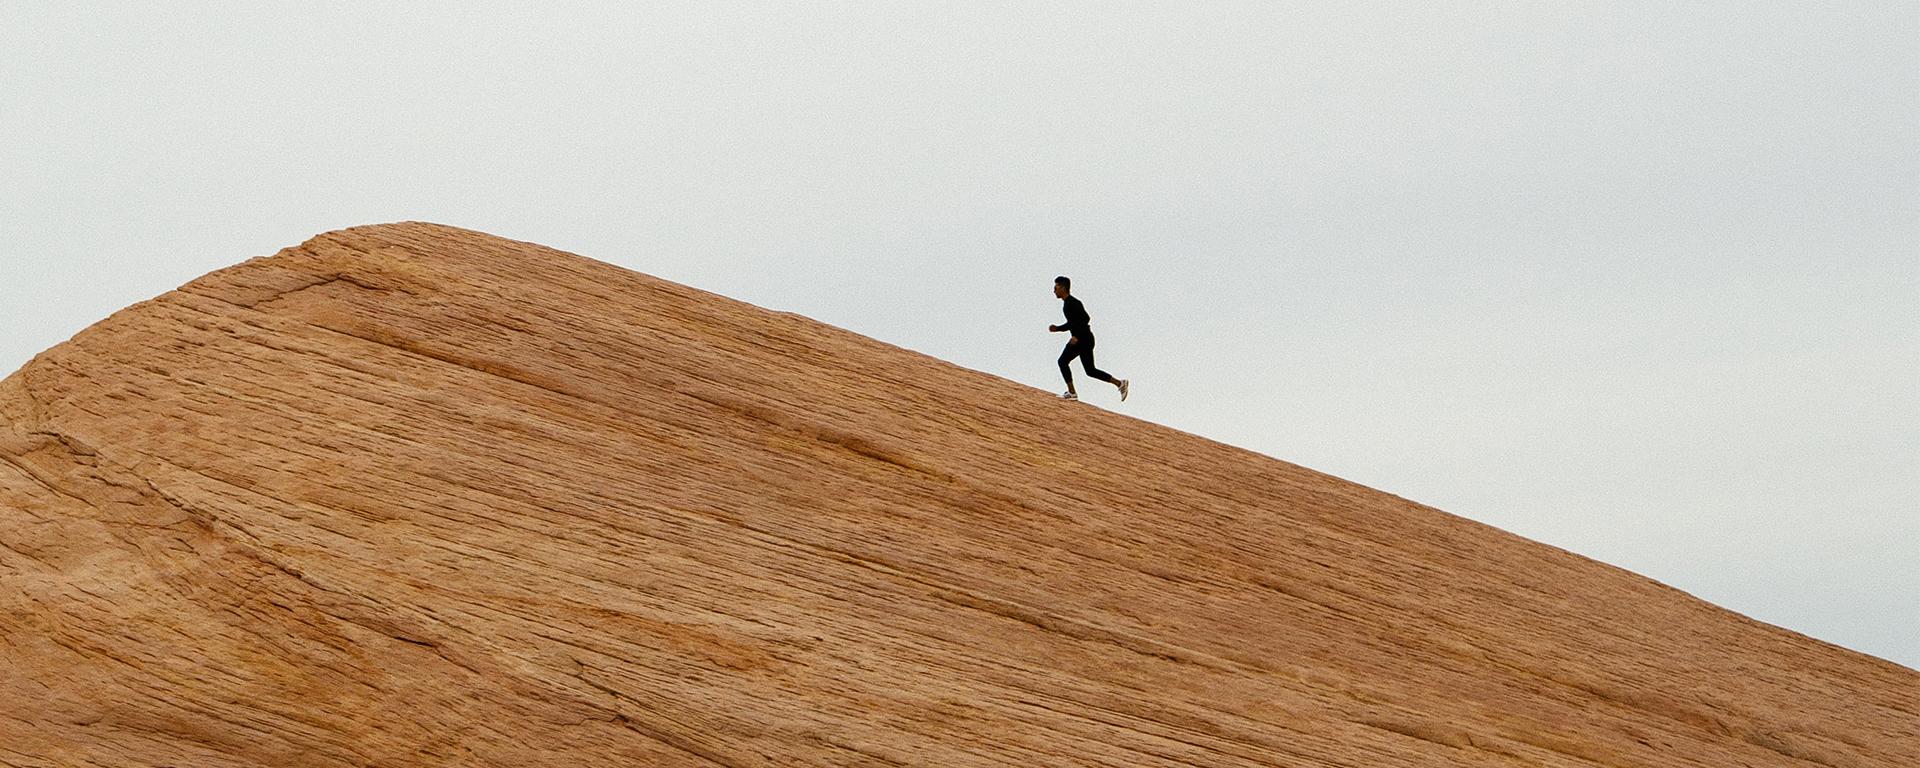 A person runs up a steep mountain